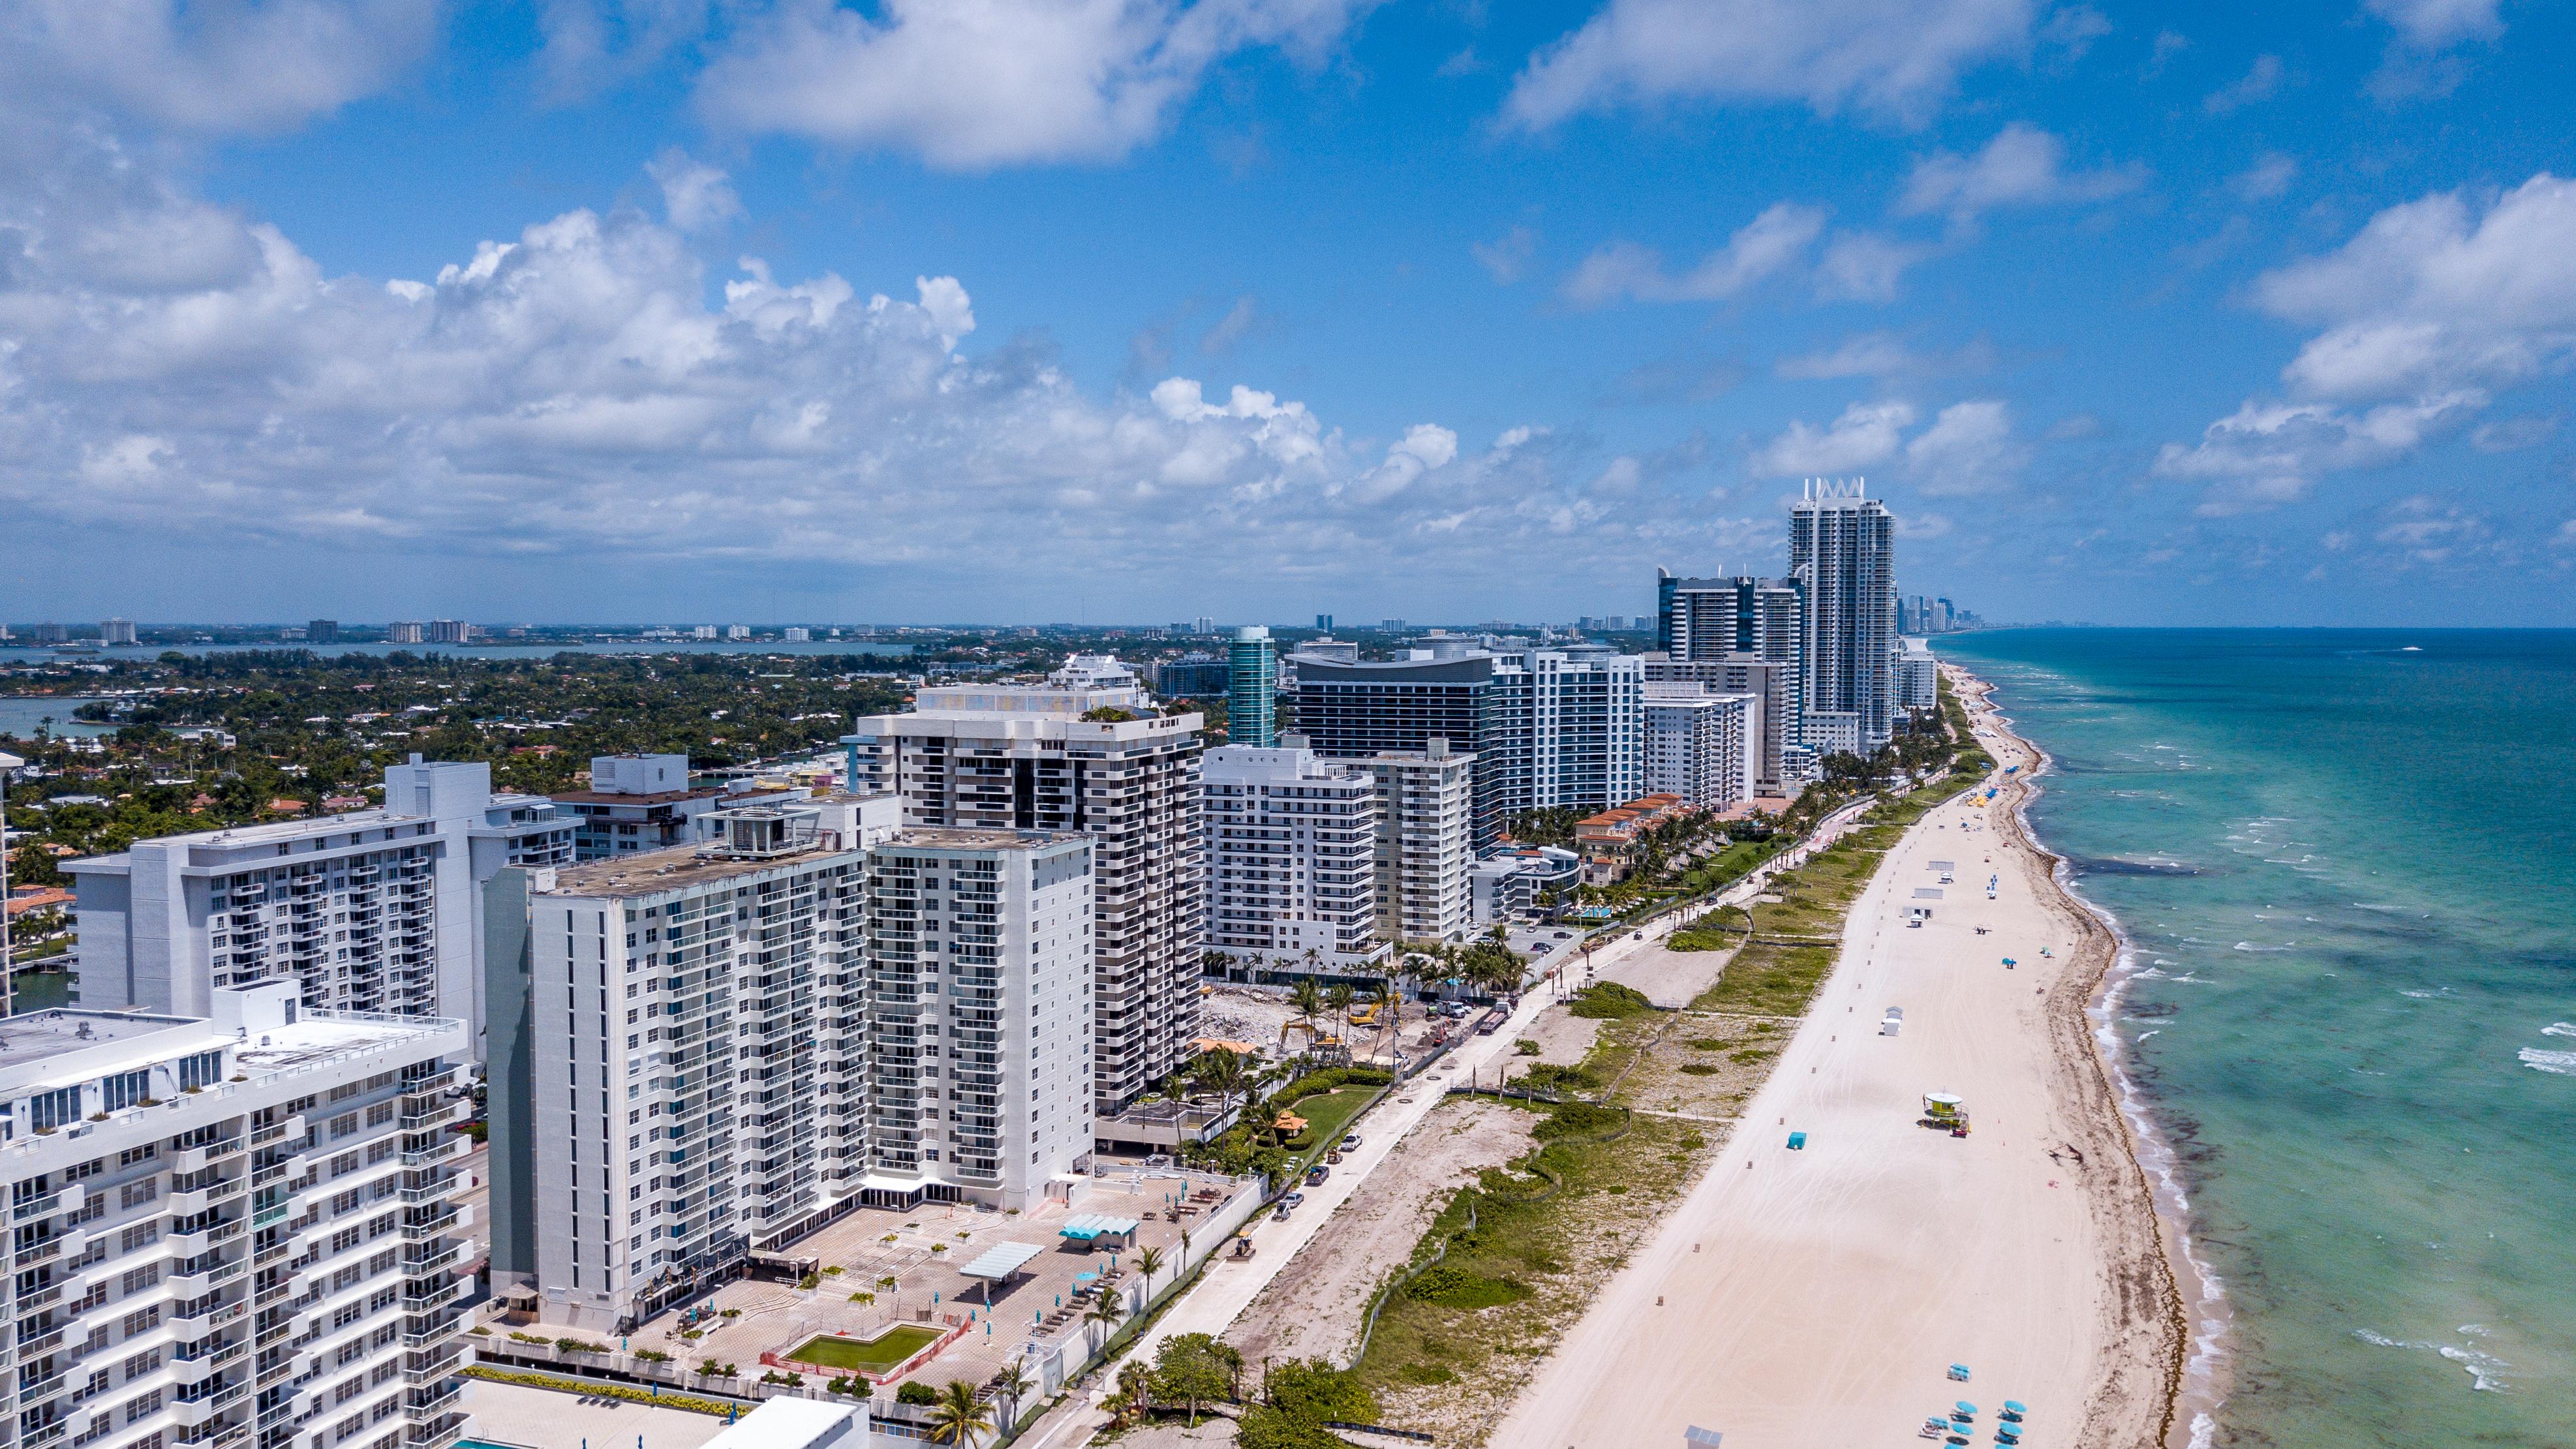 High aerial of the Miami Beach Coast. (Shutterstock/South Florida Aerials)